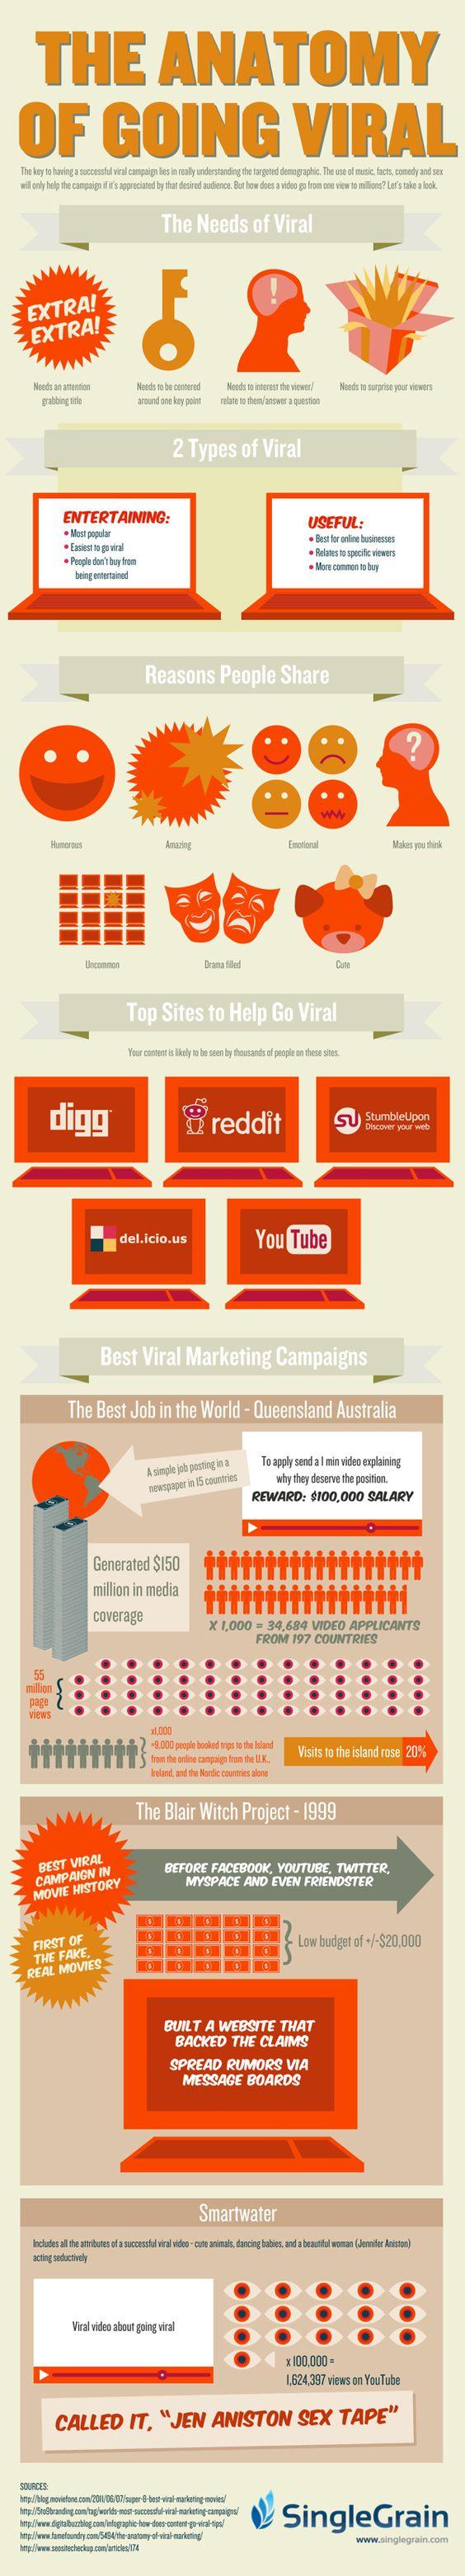 The Anatomy of Viral Marketing